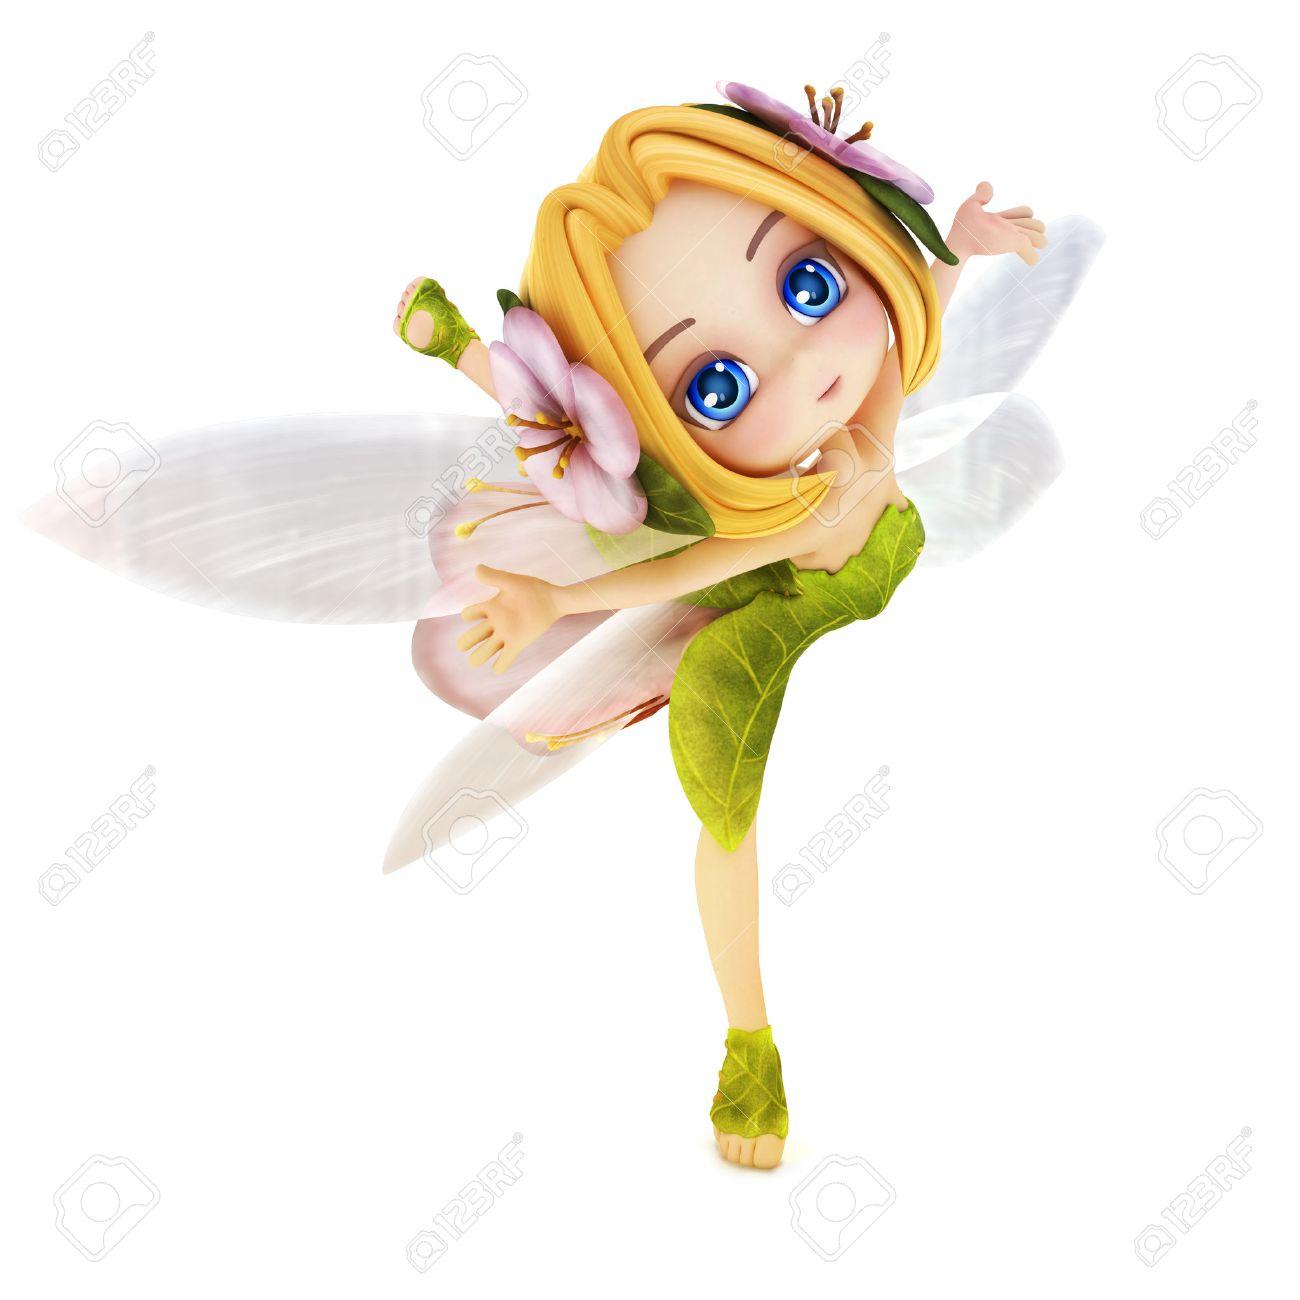 cute toon ballerina fairy on a white background stock photo